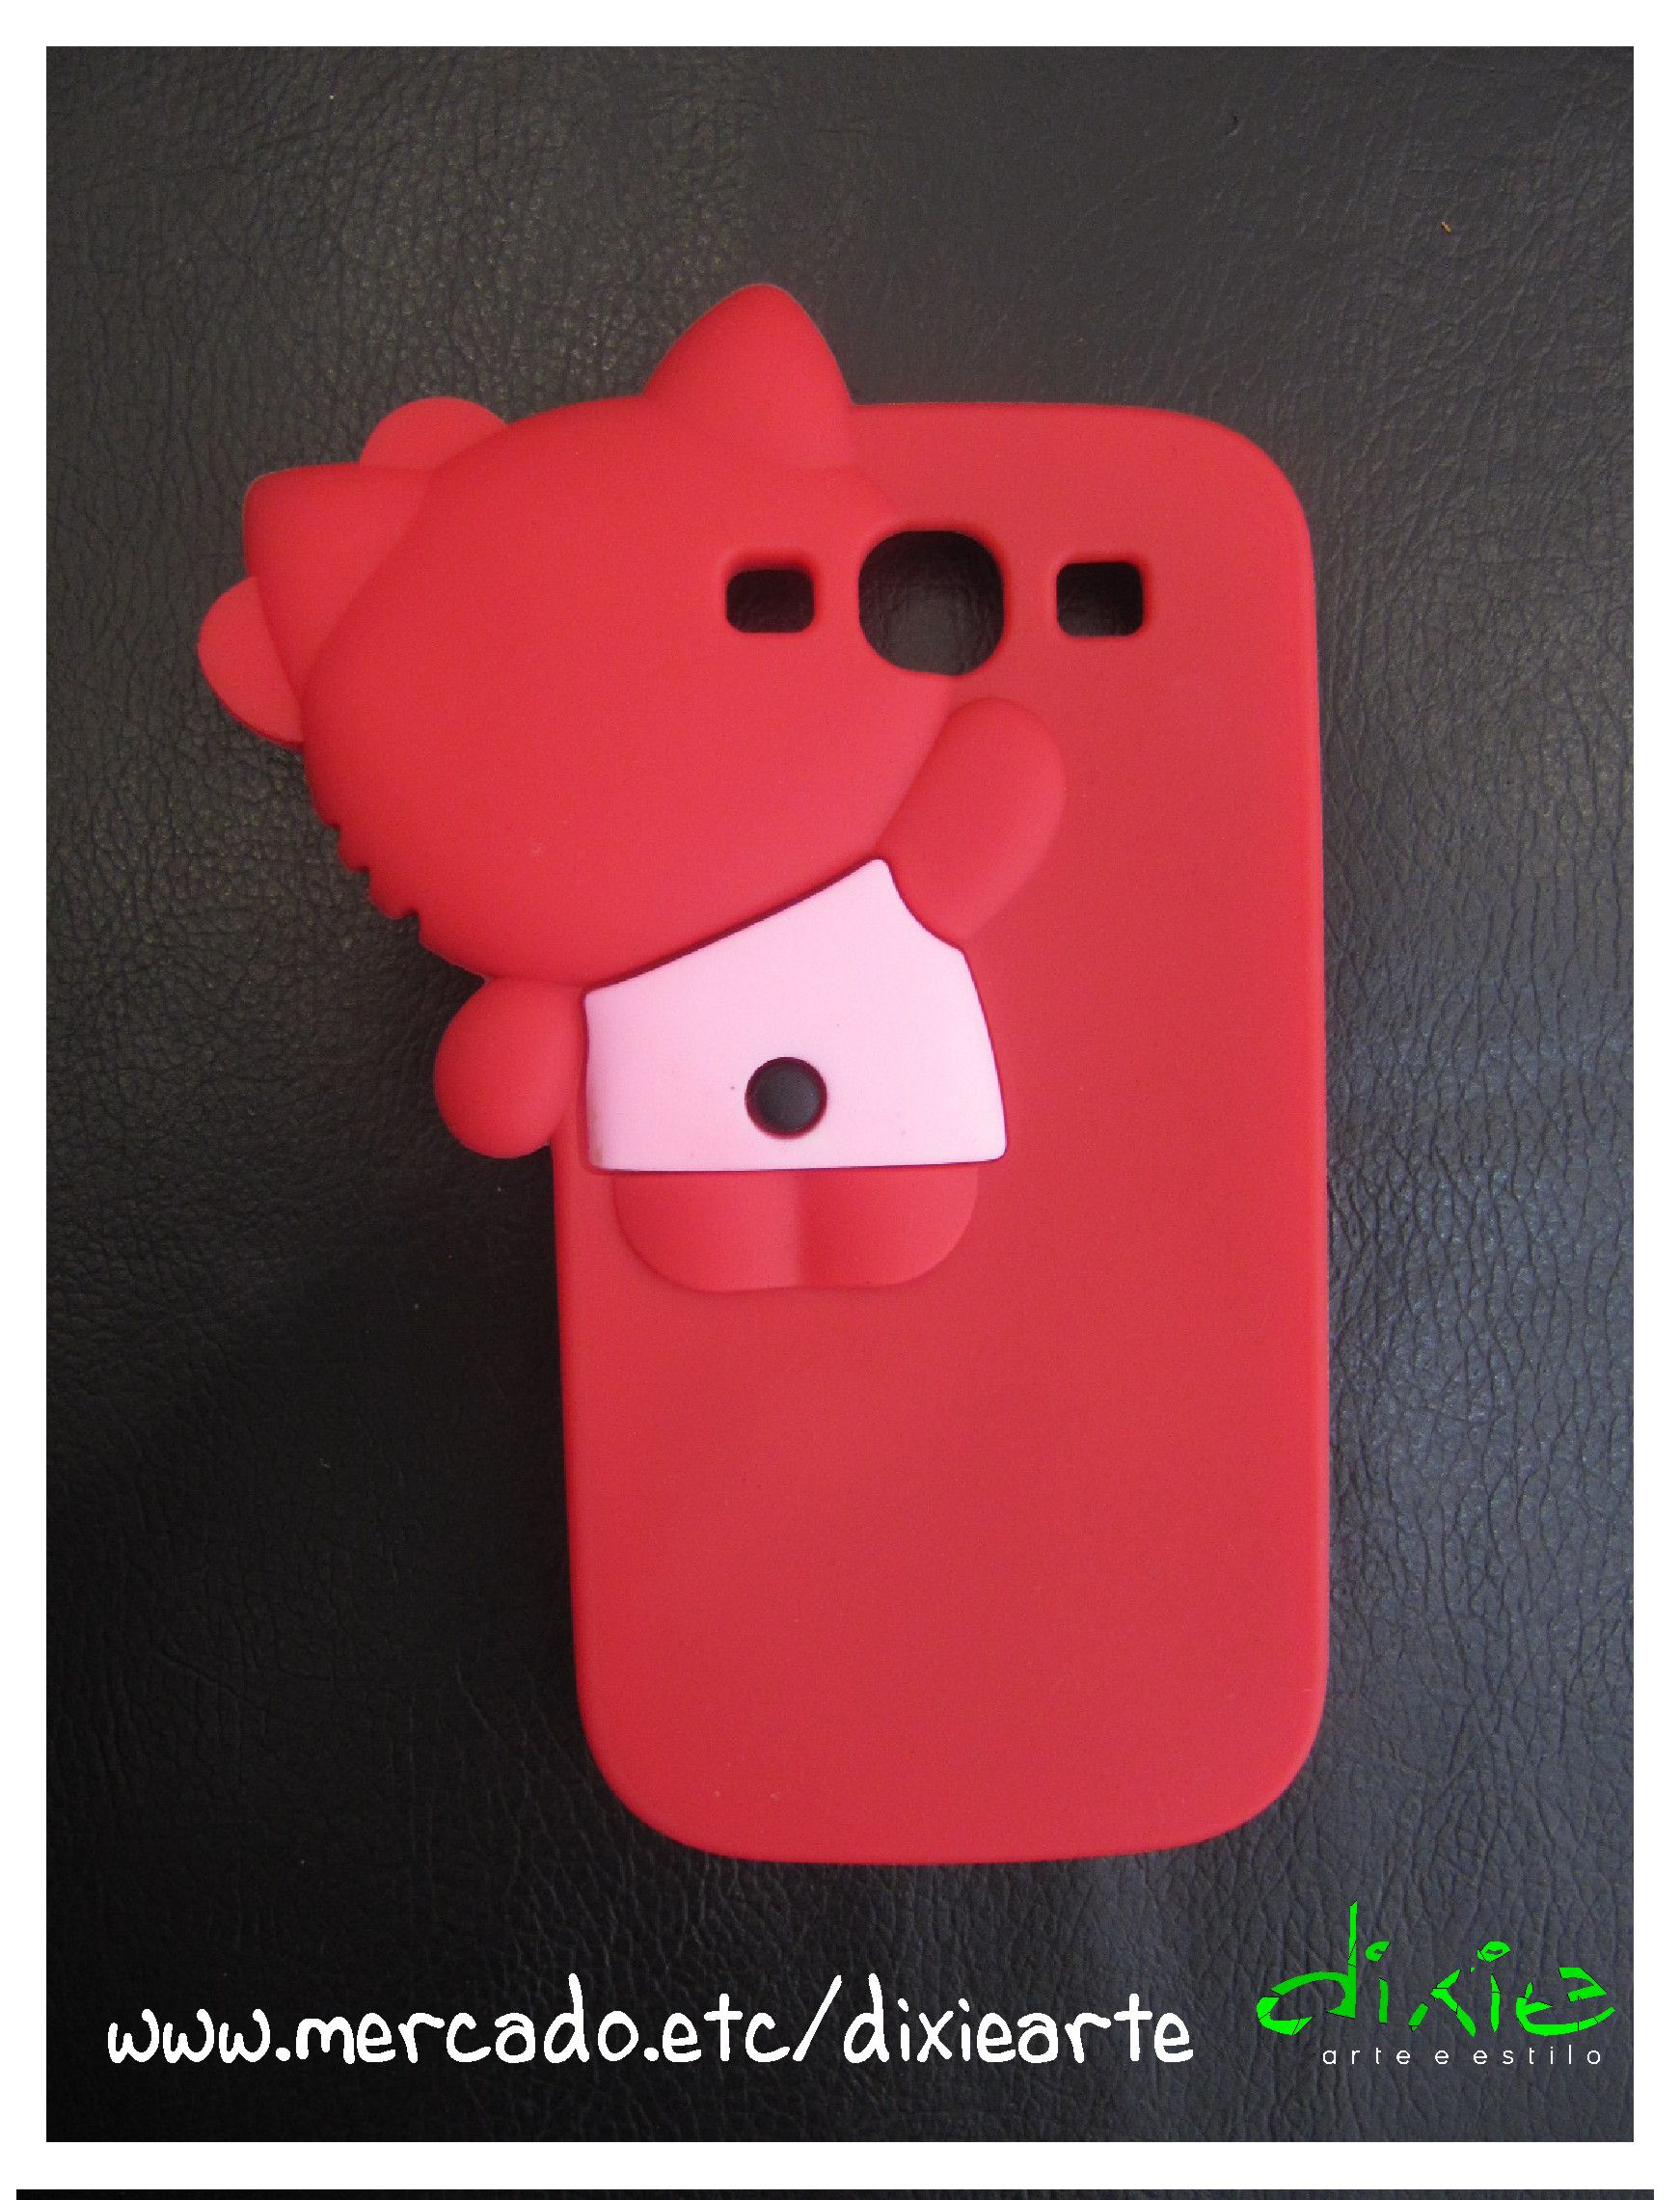 Case Hello Kitty Vermelho  www.mercado.etc.br/dixiearte